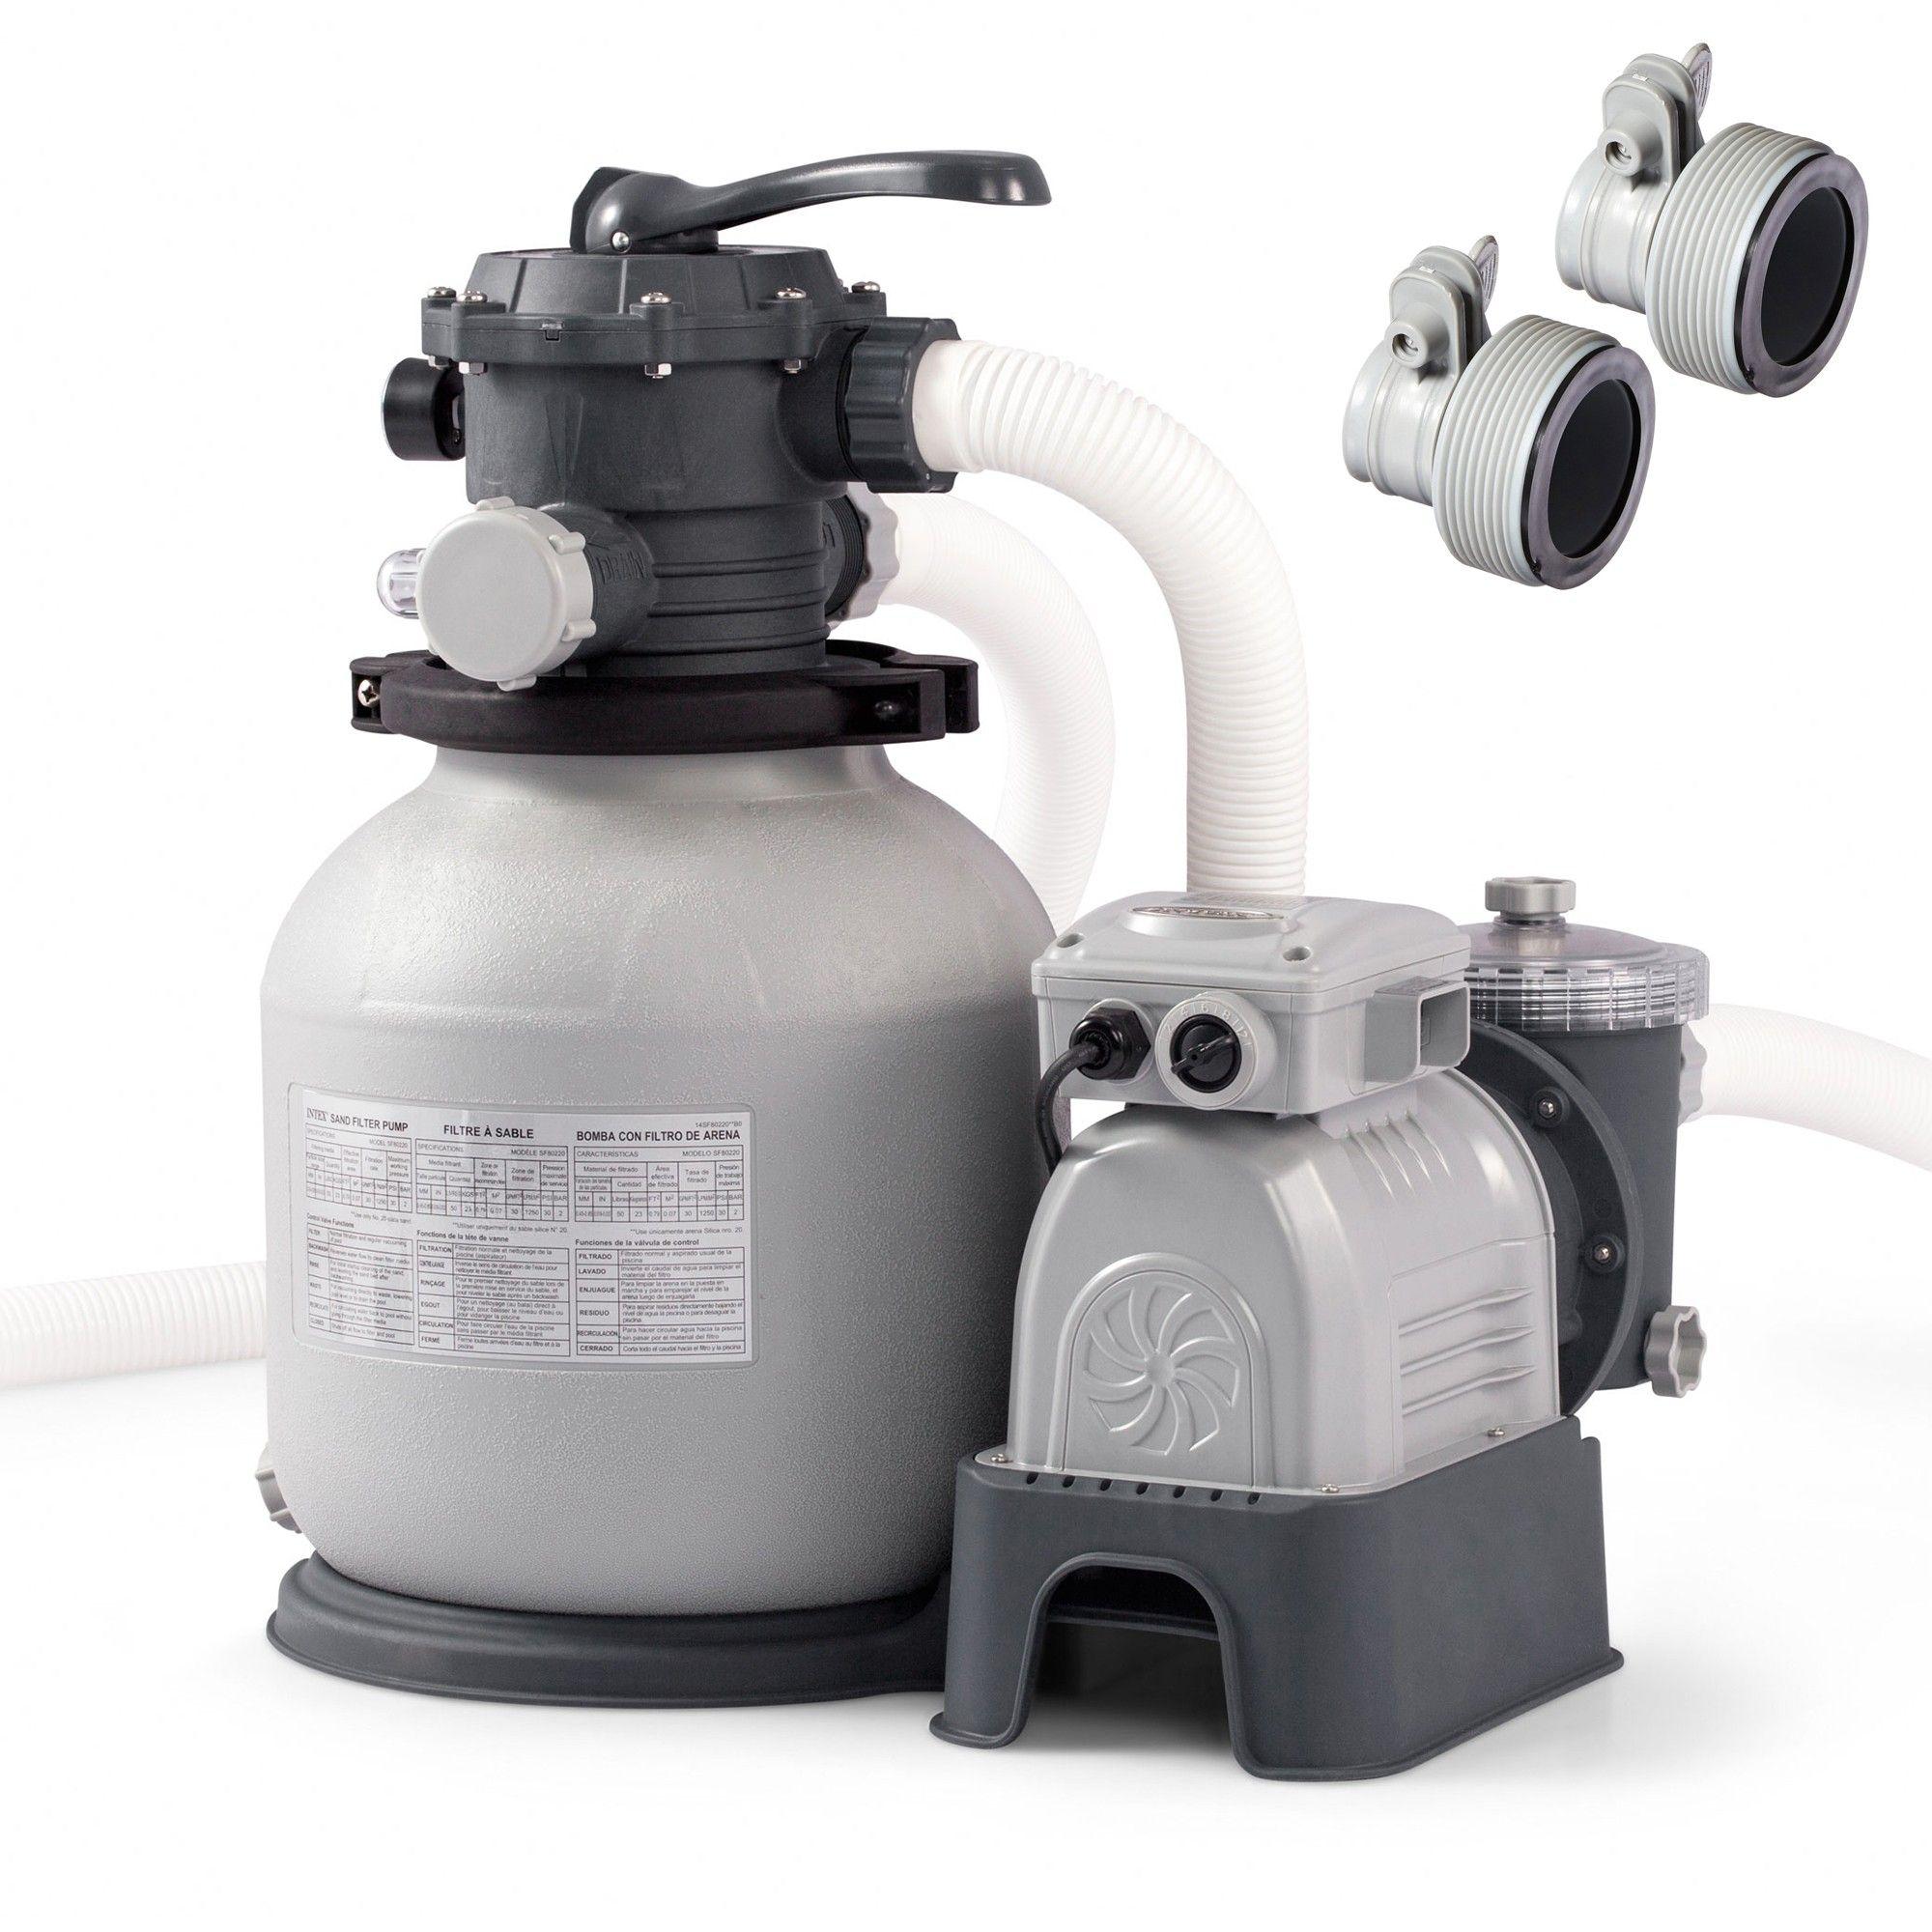 Intex Replacement Hose Adapter B Pair Sand Filter Above Ground Pool Pump Above Ground Pool Pumps Pool Pump Above Ground Pool